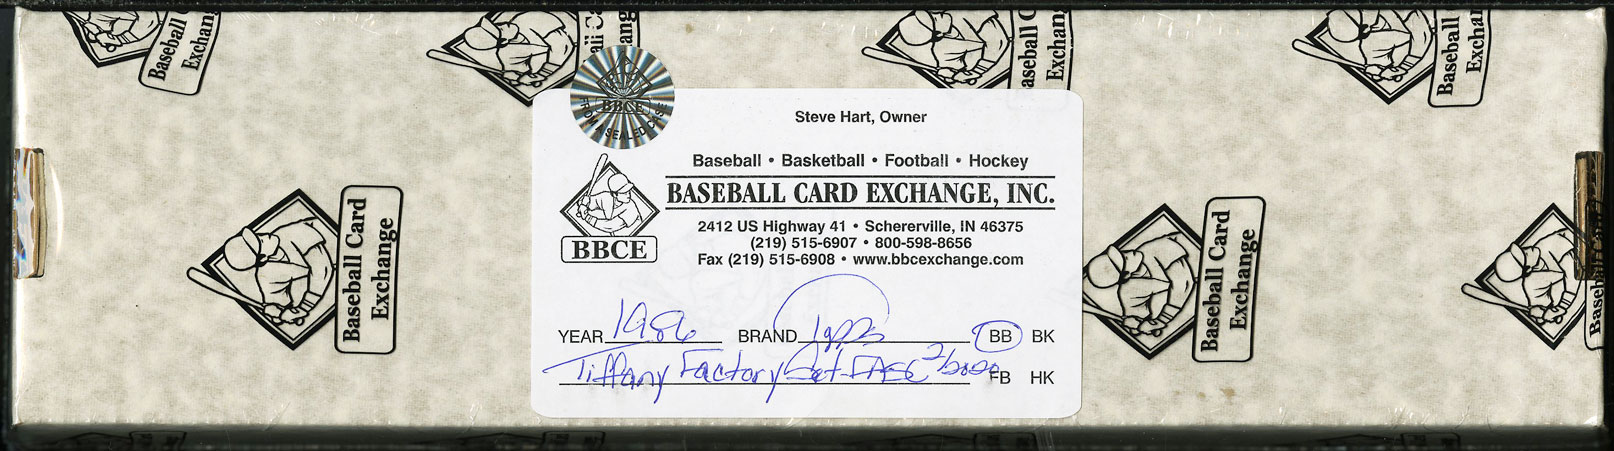 1986 Topps Tiffany FASC Factory Set Ryan Mattingly Clemens Puckett, BBCE Auth - Image 1